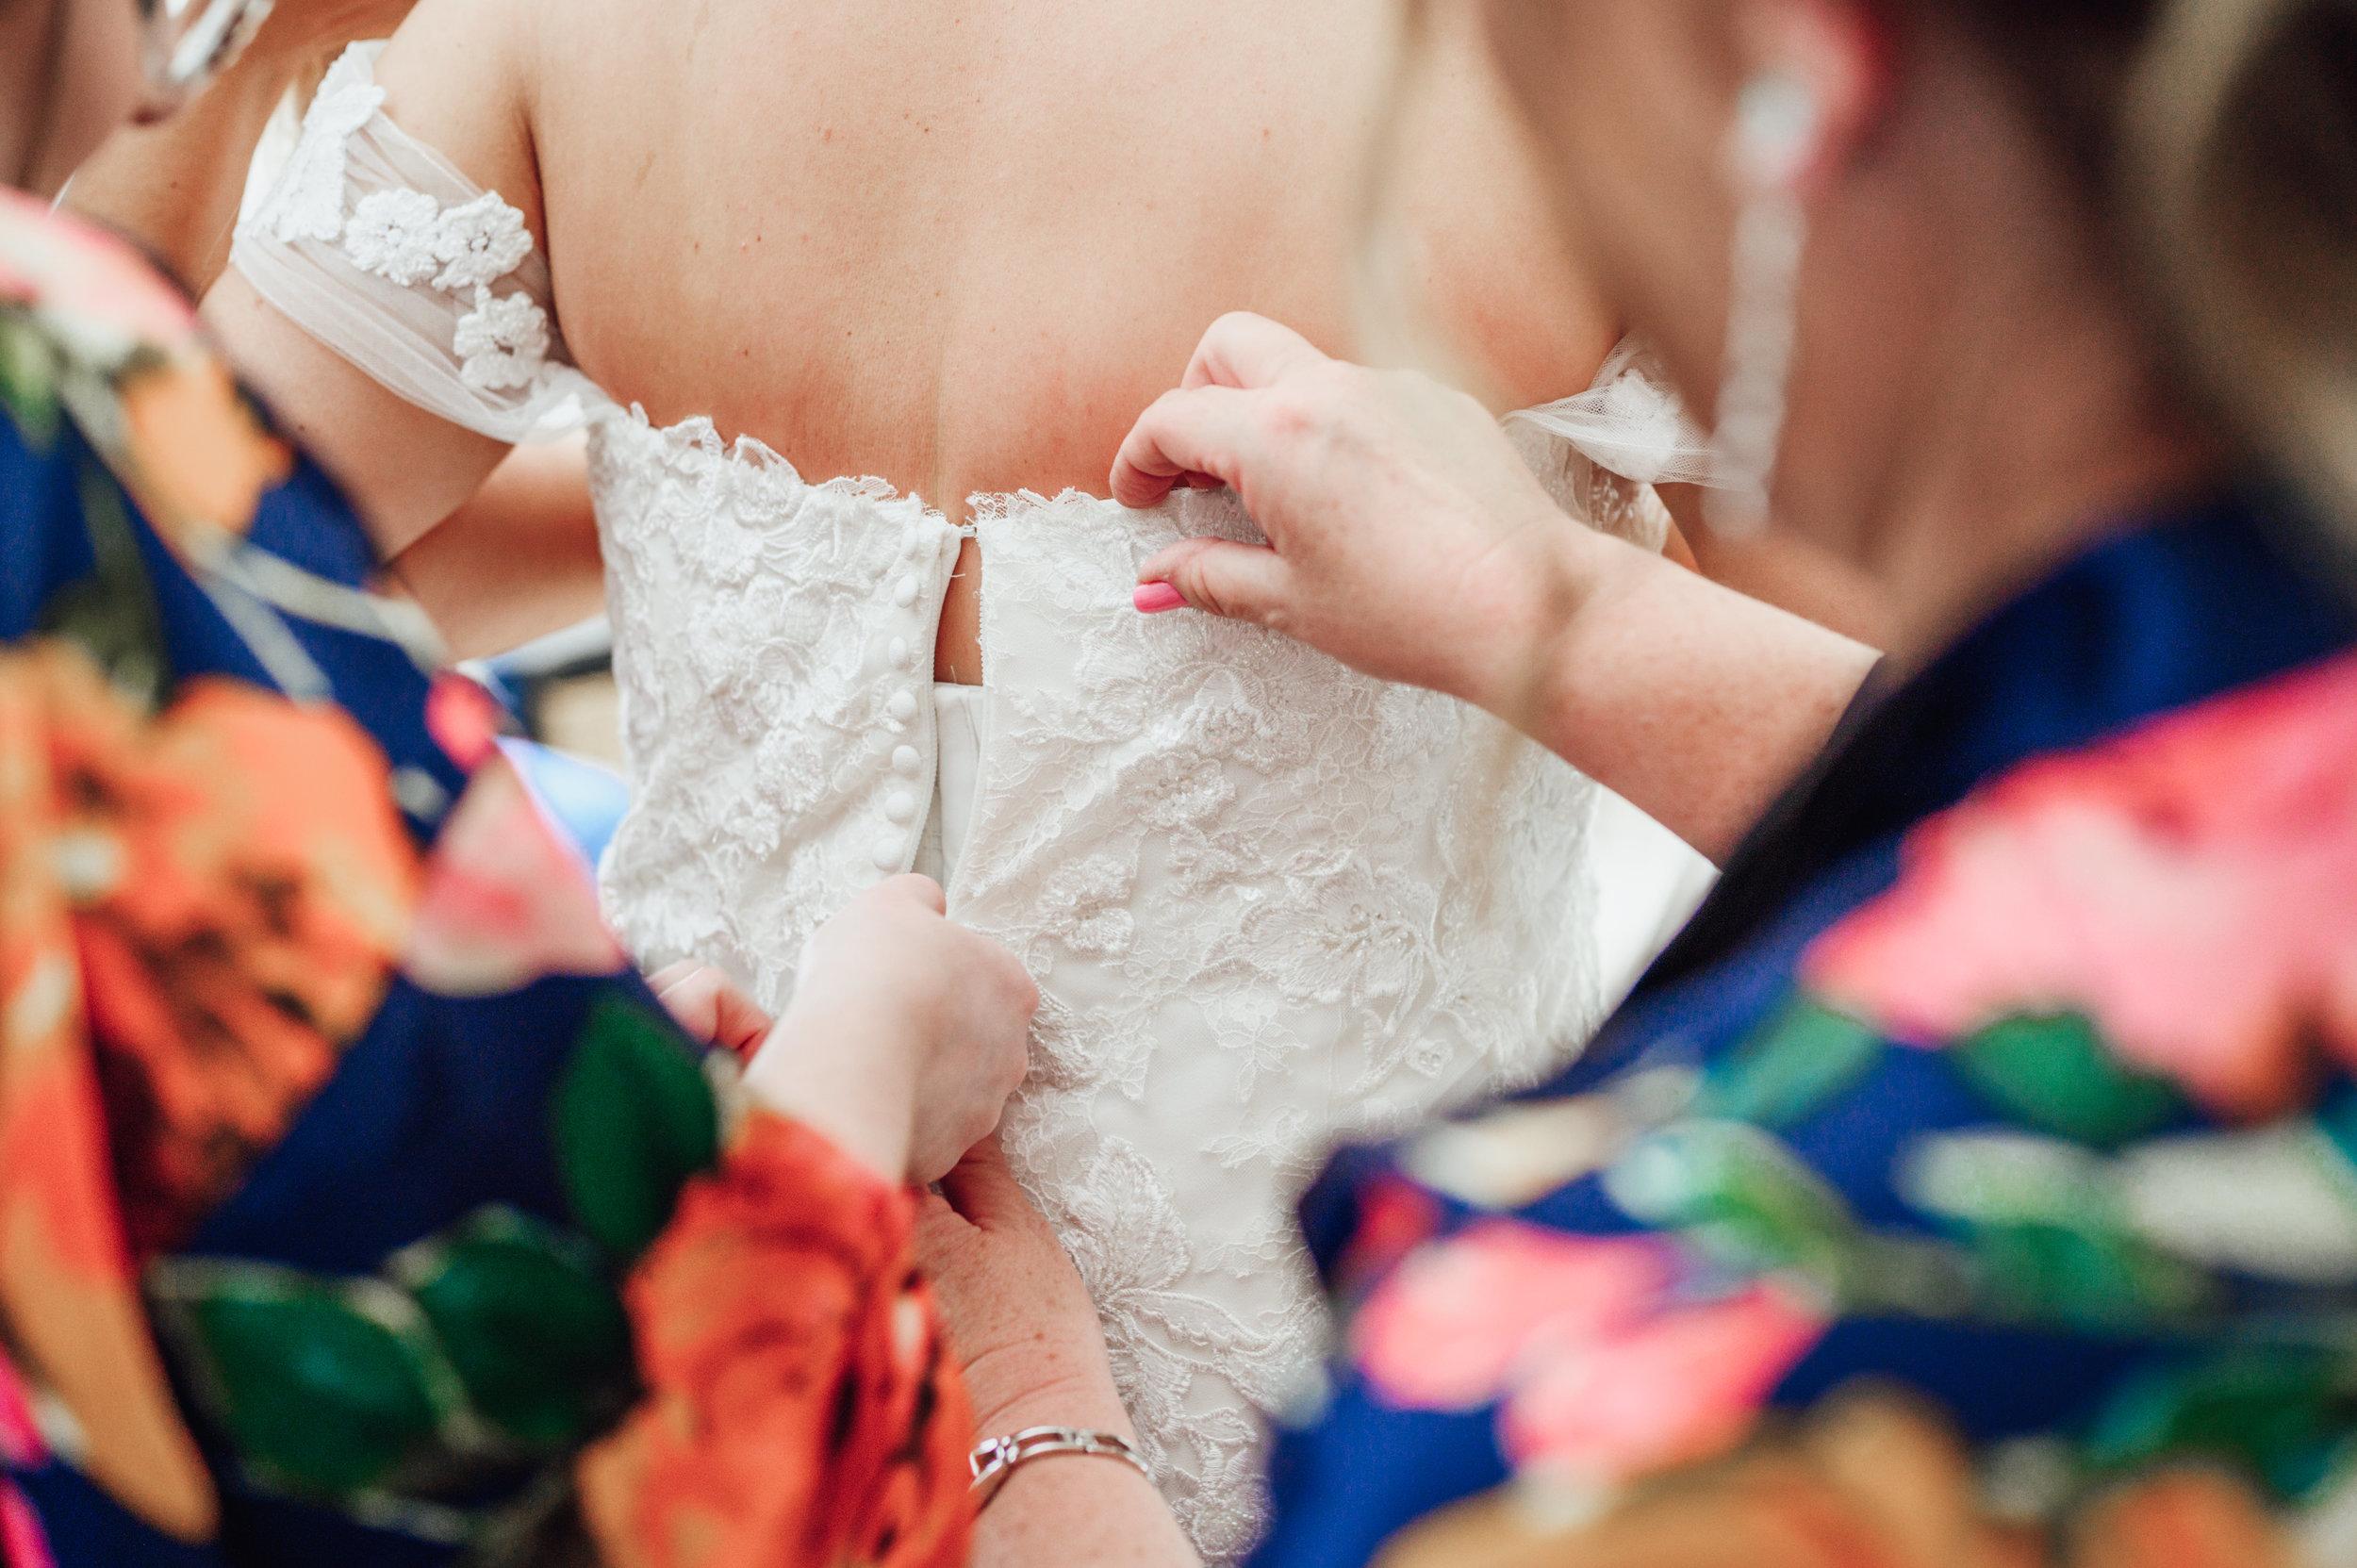 New Jersey Wedding Photographer, Felsberg Photography LBI wedding photography 31.jpg